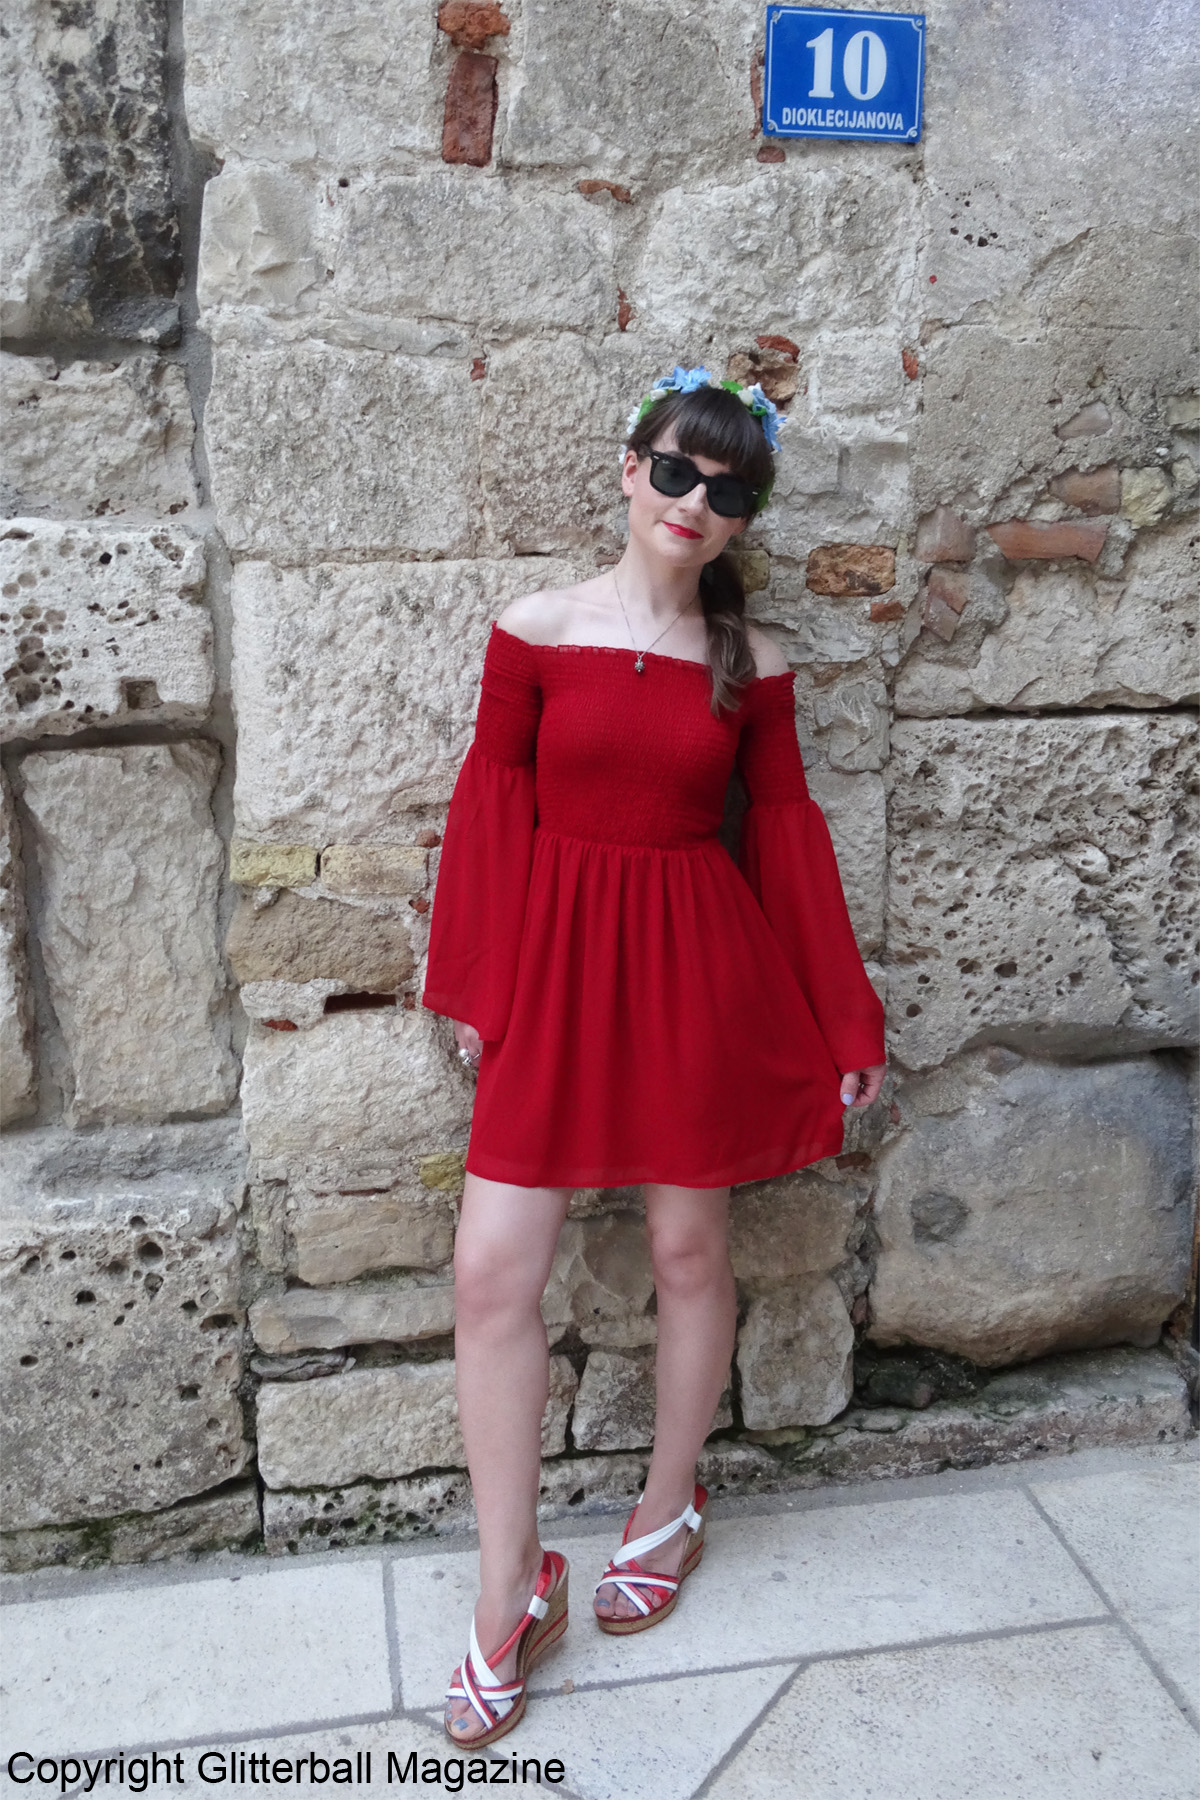 LOTW A Dramatic Dress 7